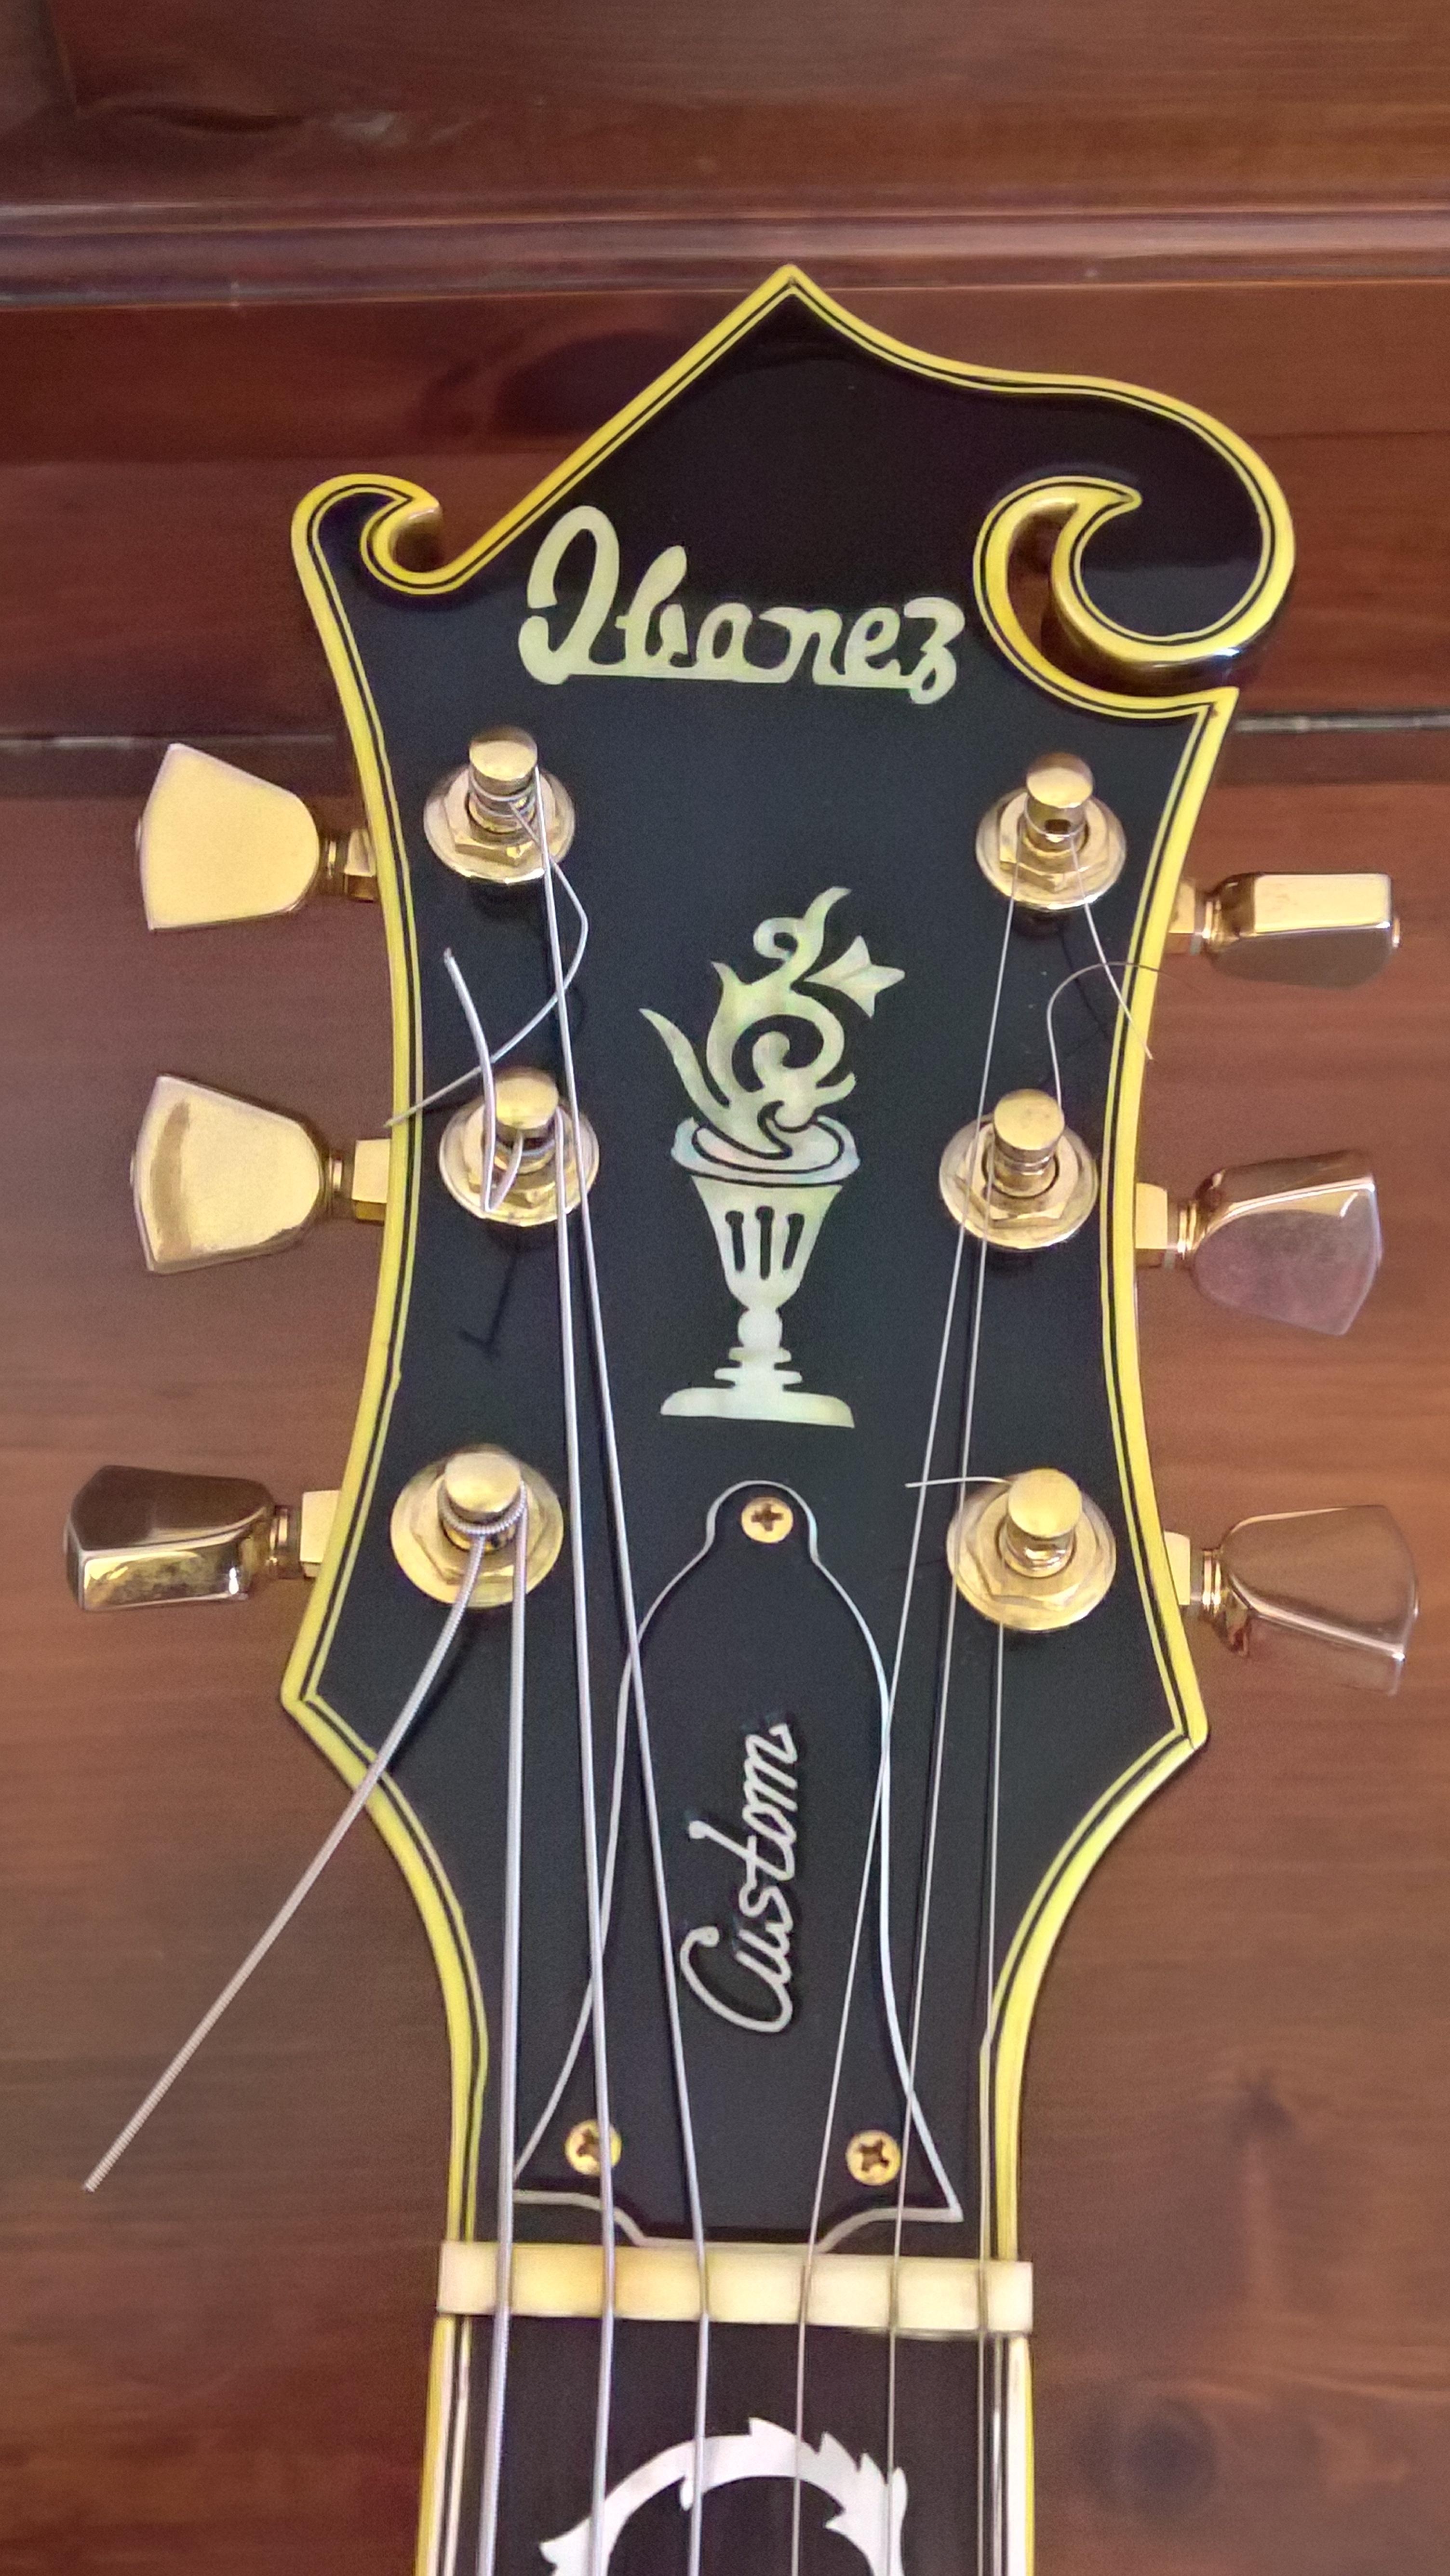 Ibanez Custom Agent – model 2405 (sunburst) | Enzo Contini Blog